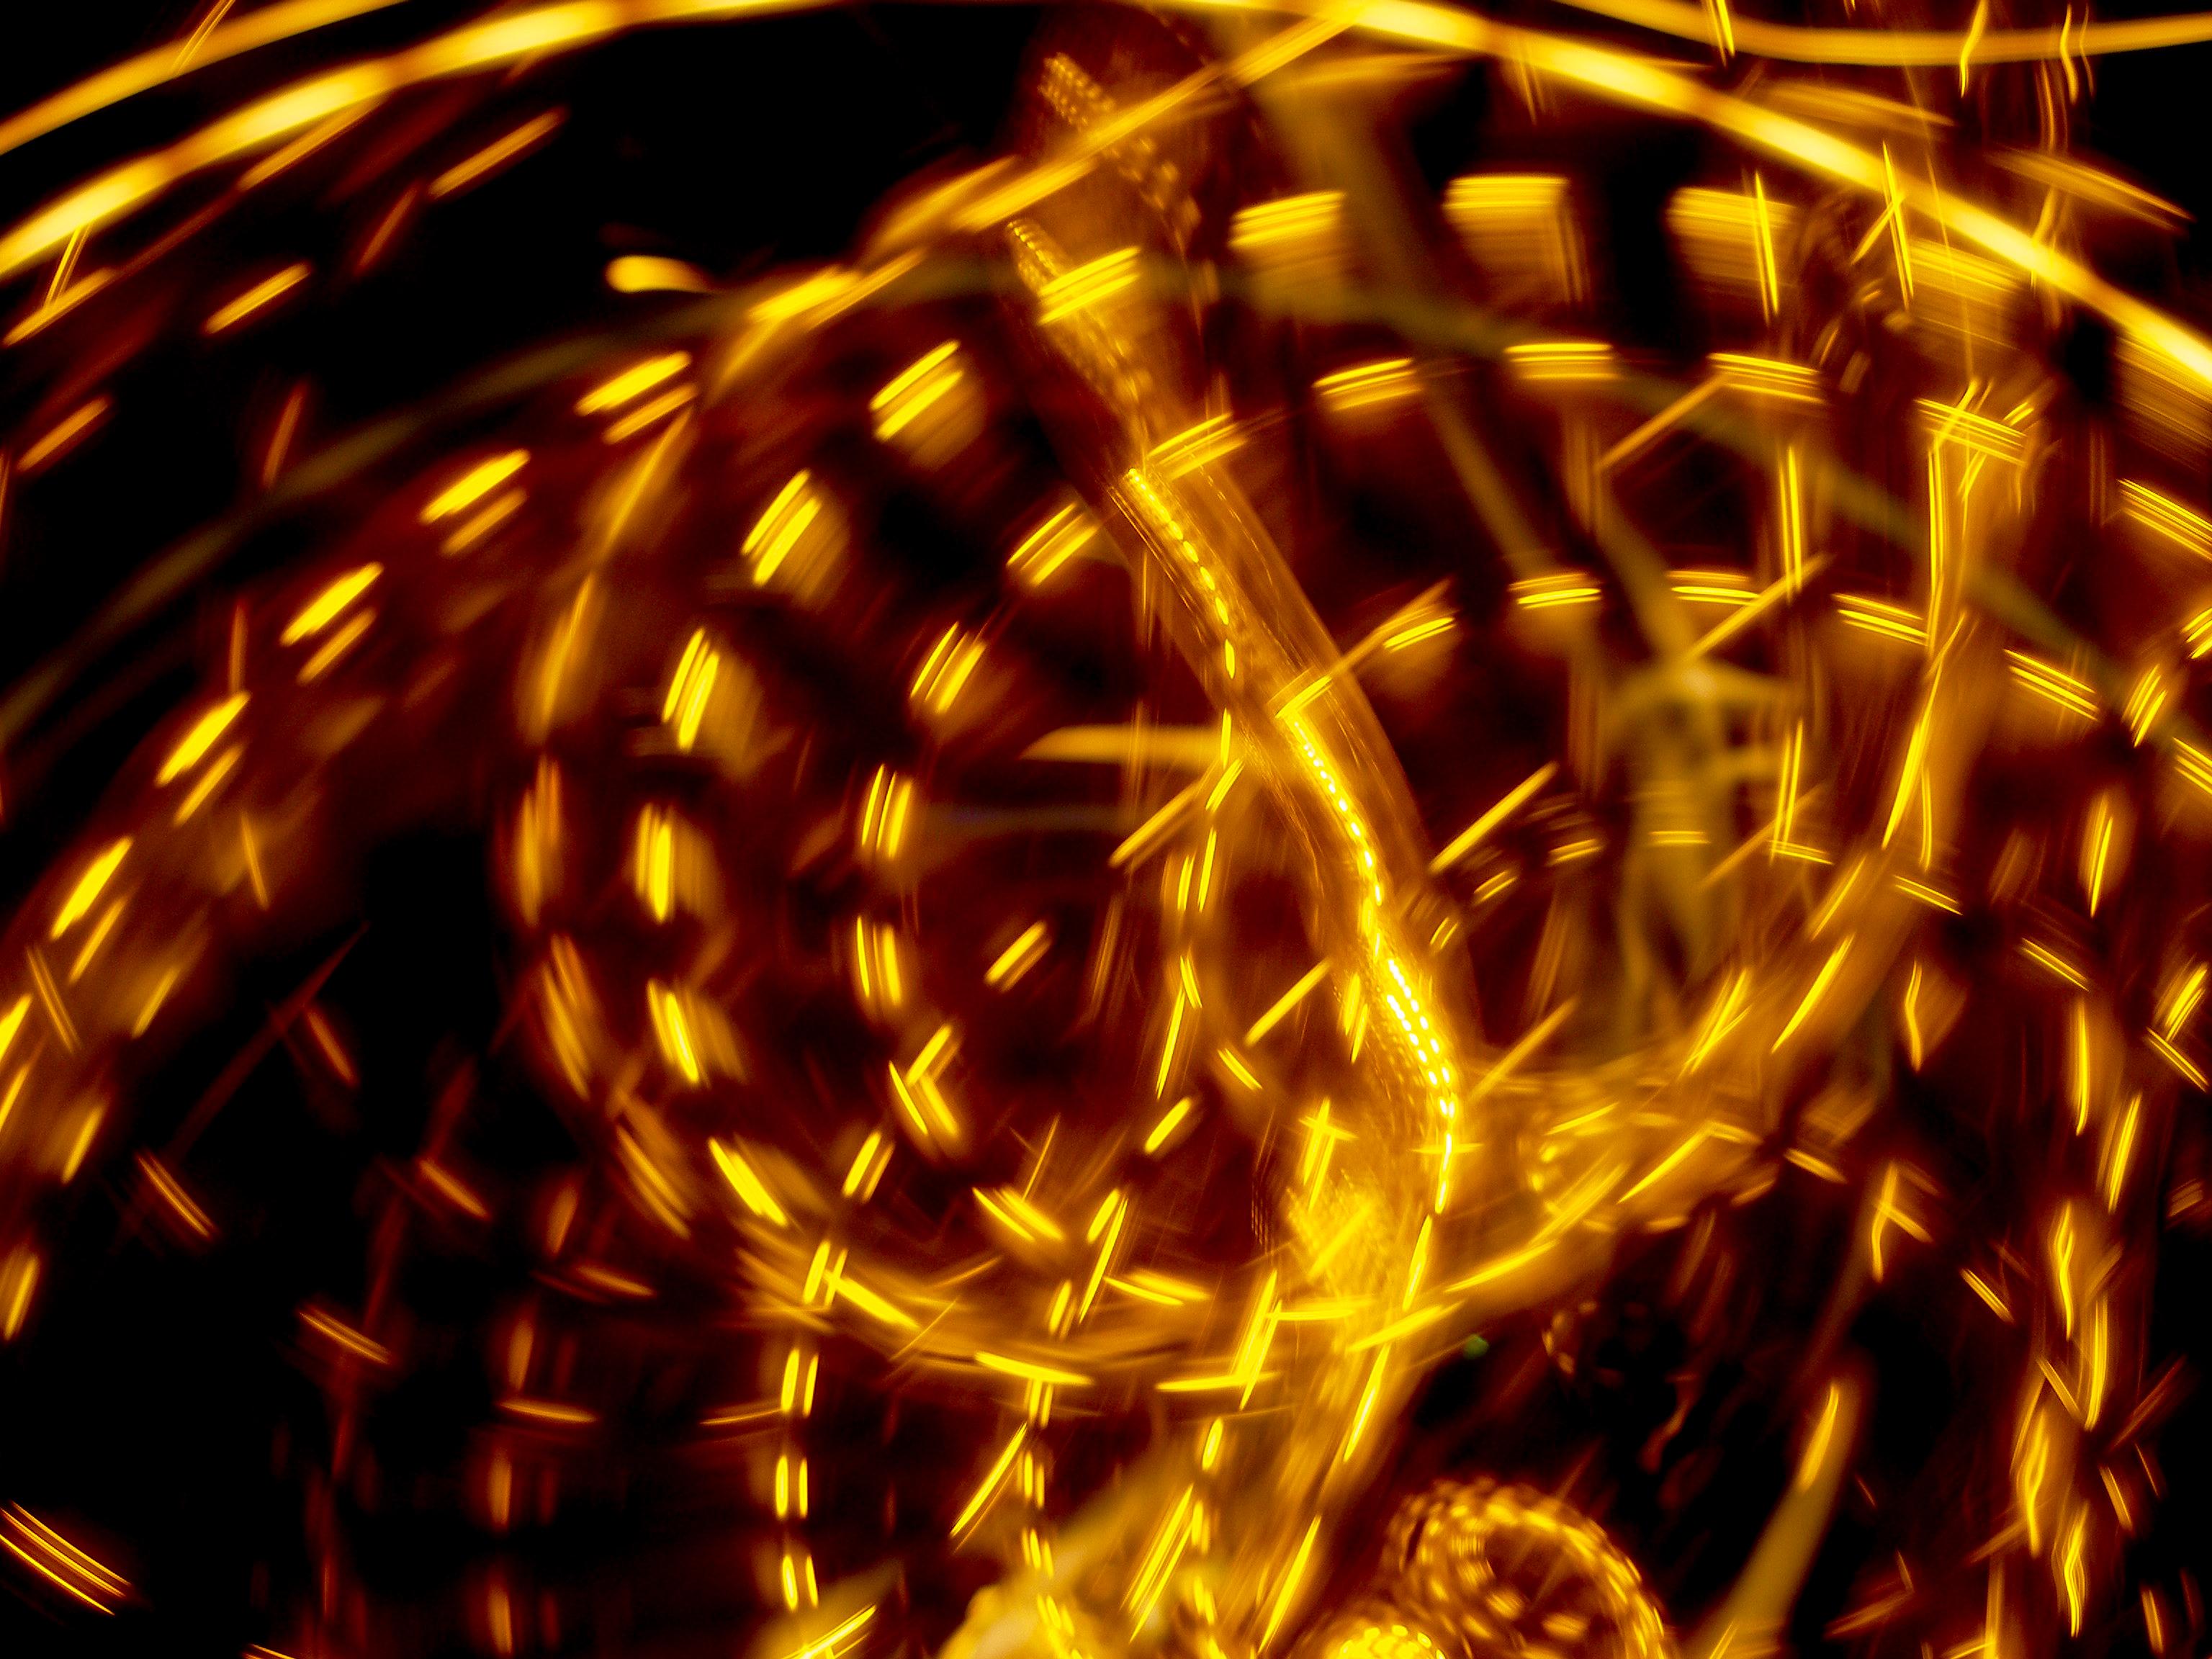 Camera Toss Kinetic Artistic Photography Yellow Light Swirl Light Trails 3072x2304